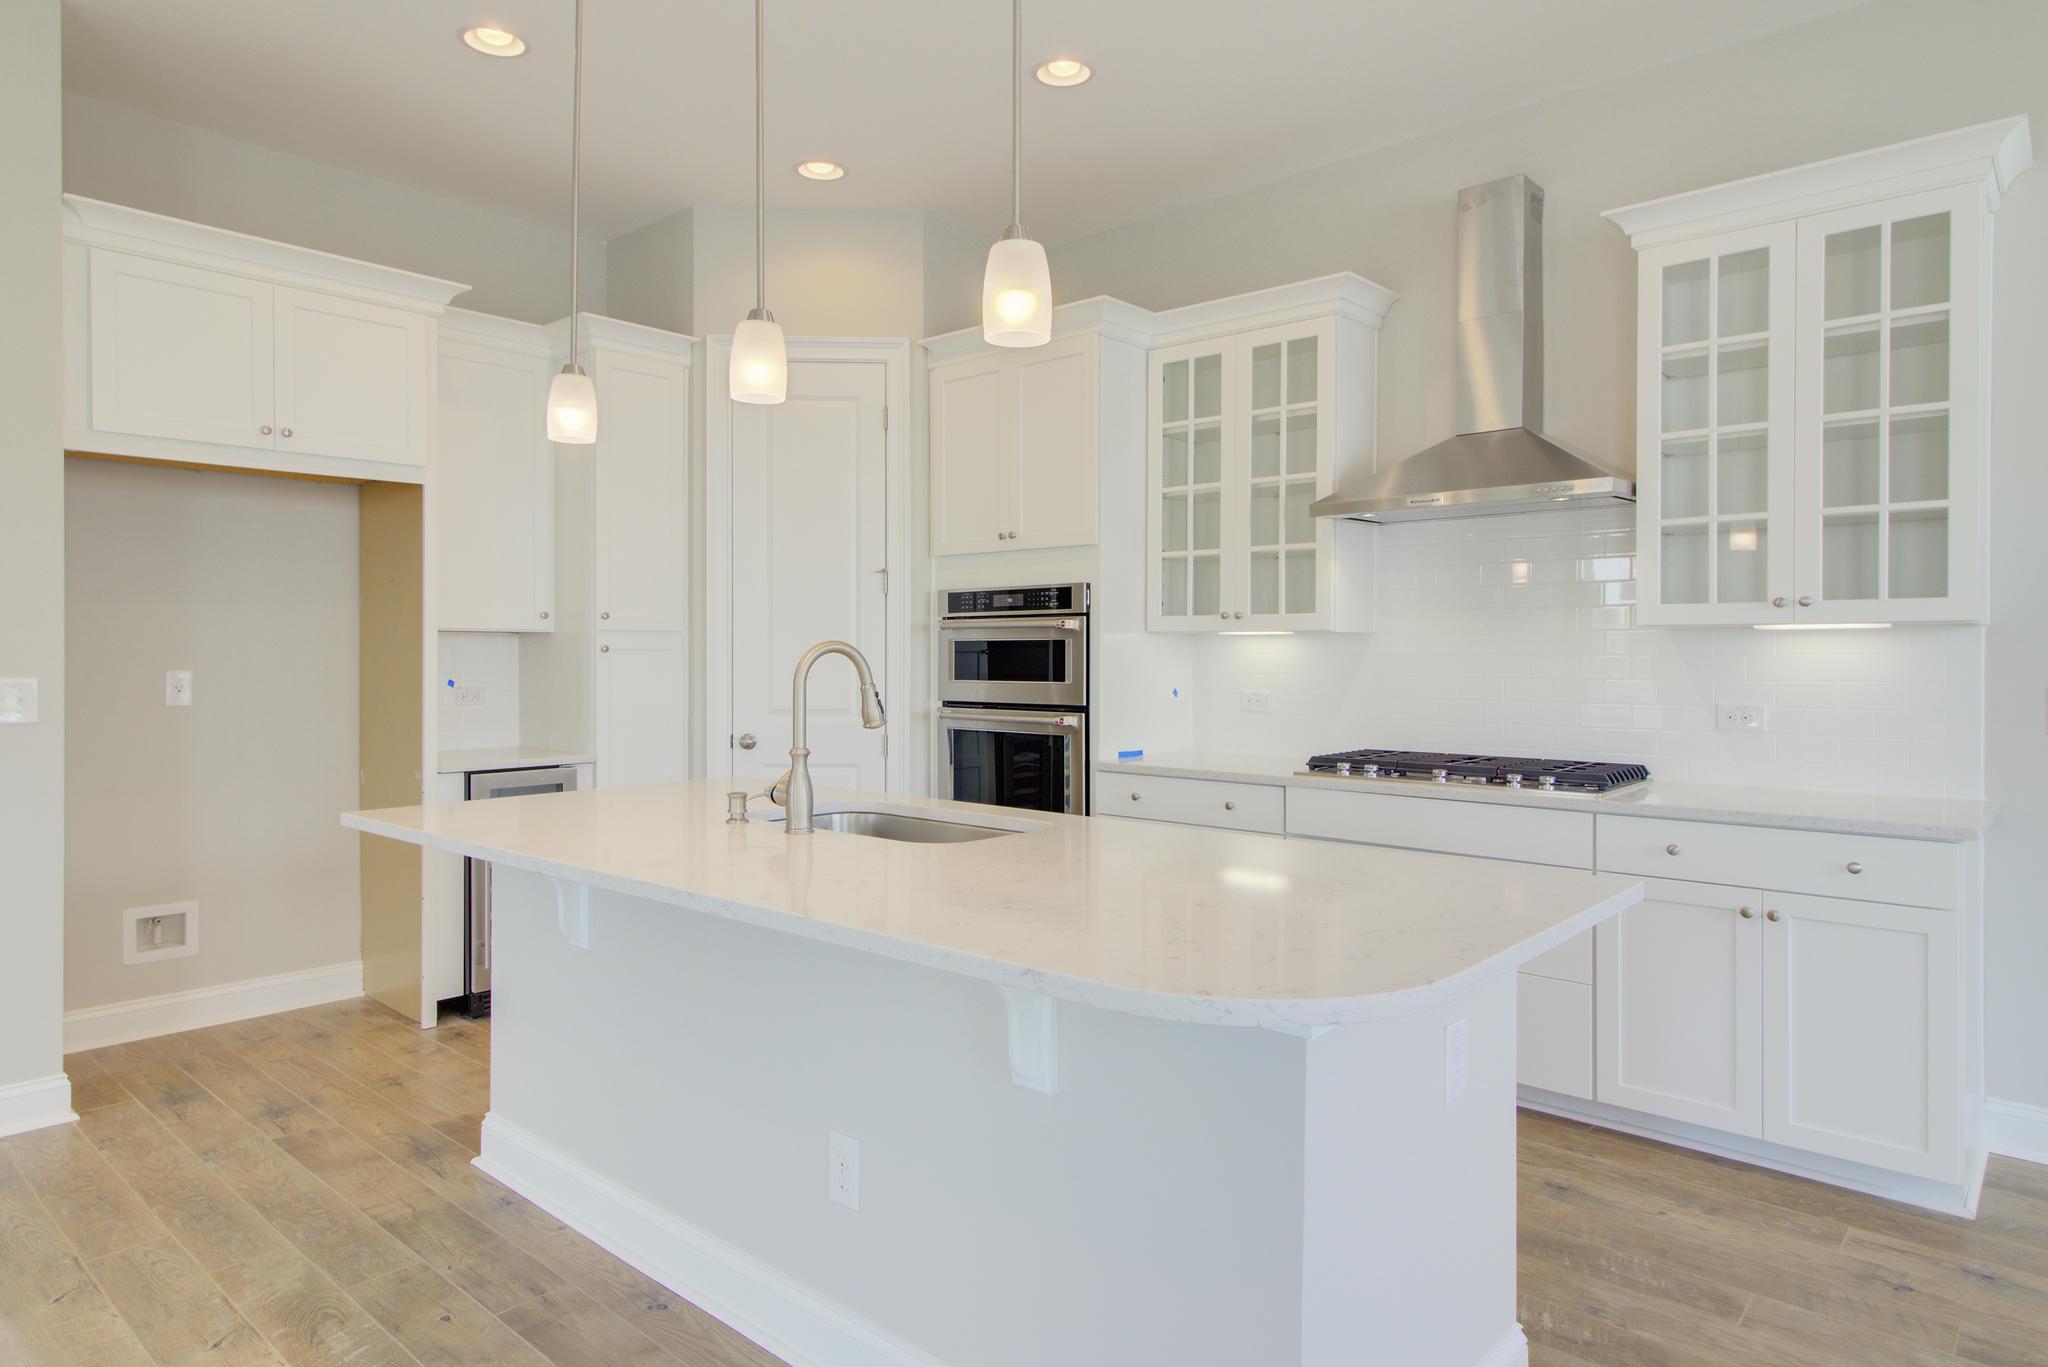 Carolina Park Homes For Sale - 1767 Agate Bay, Mount Pleasant, SC - 0